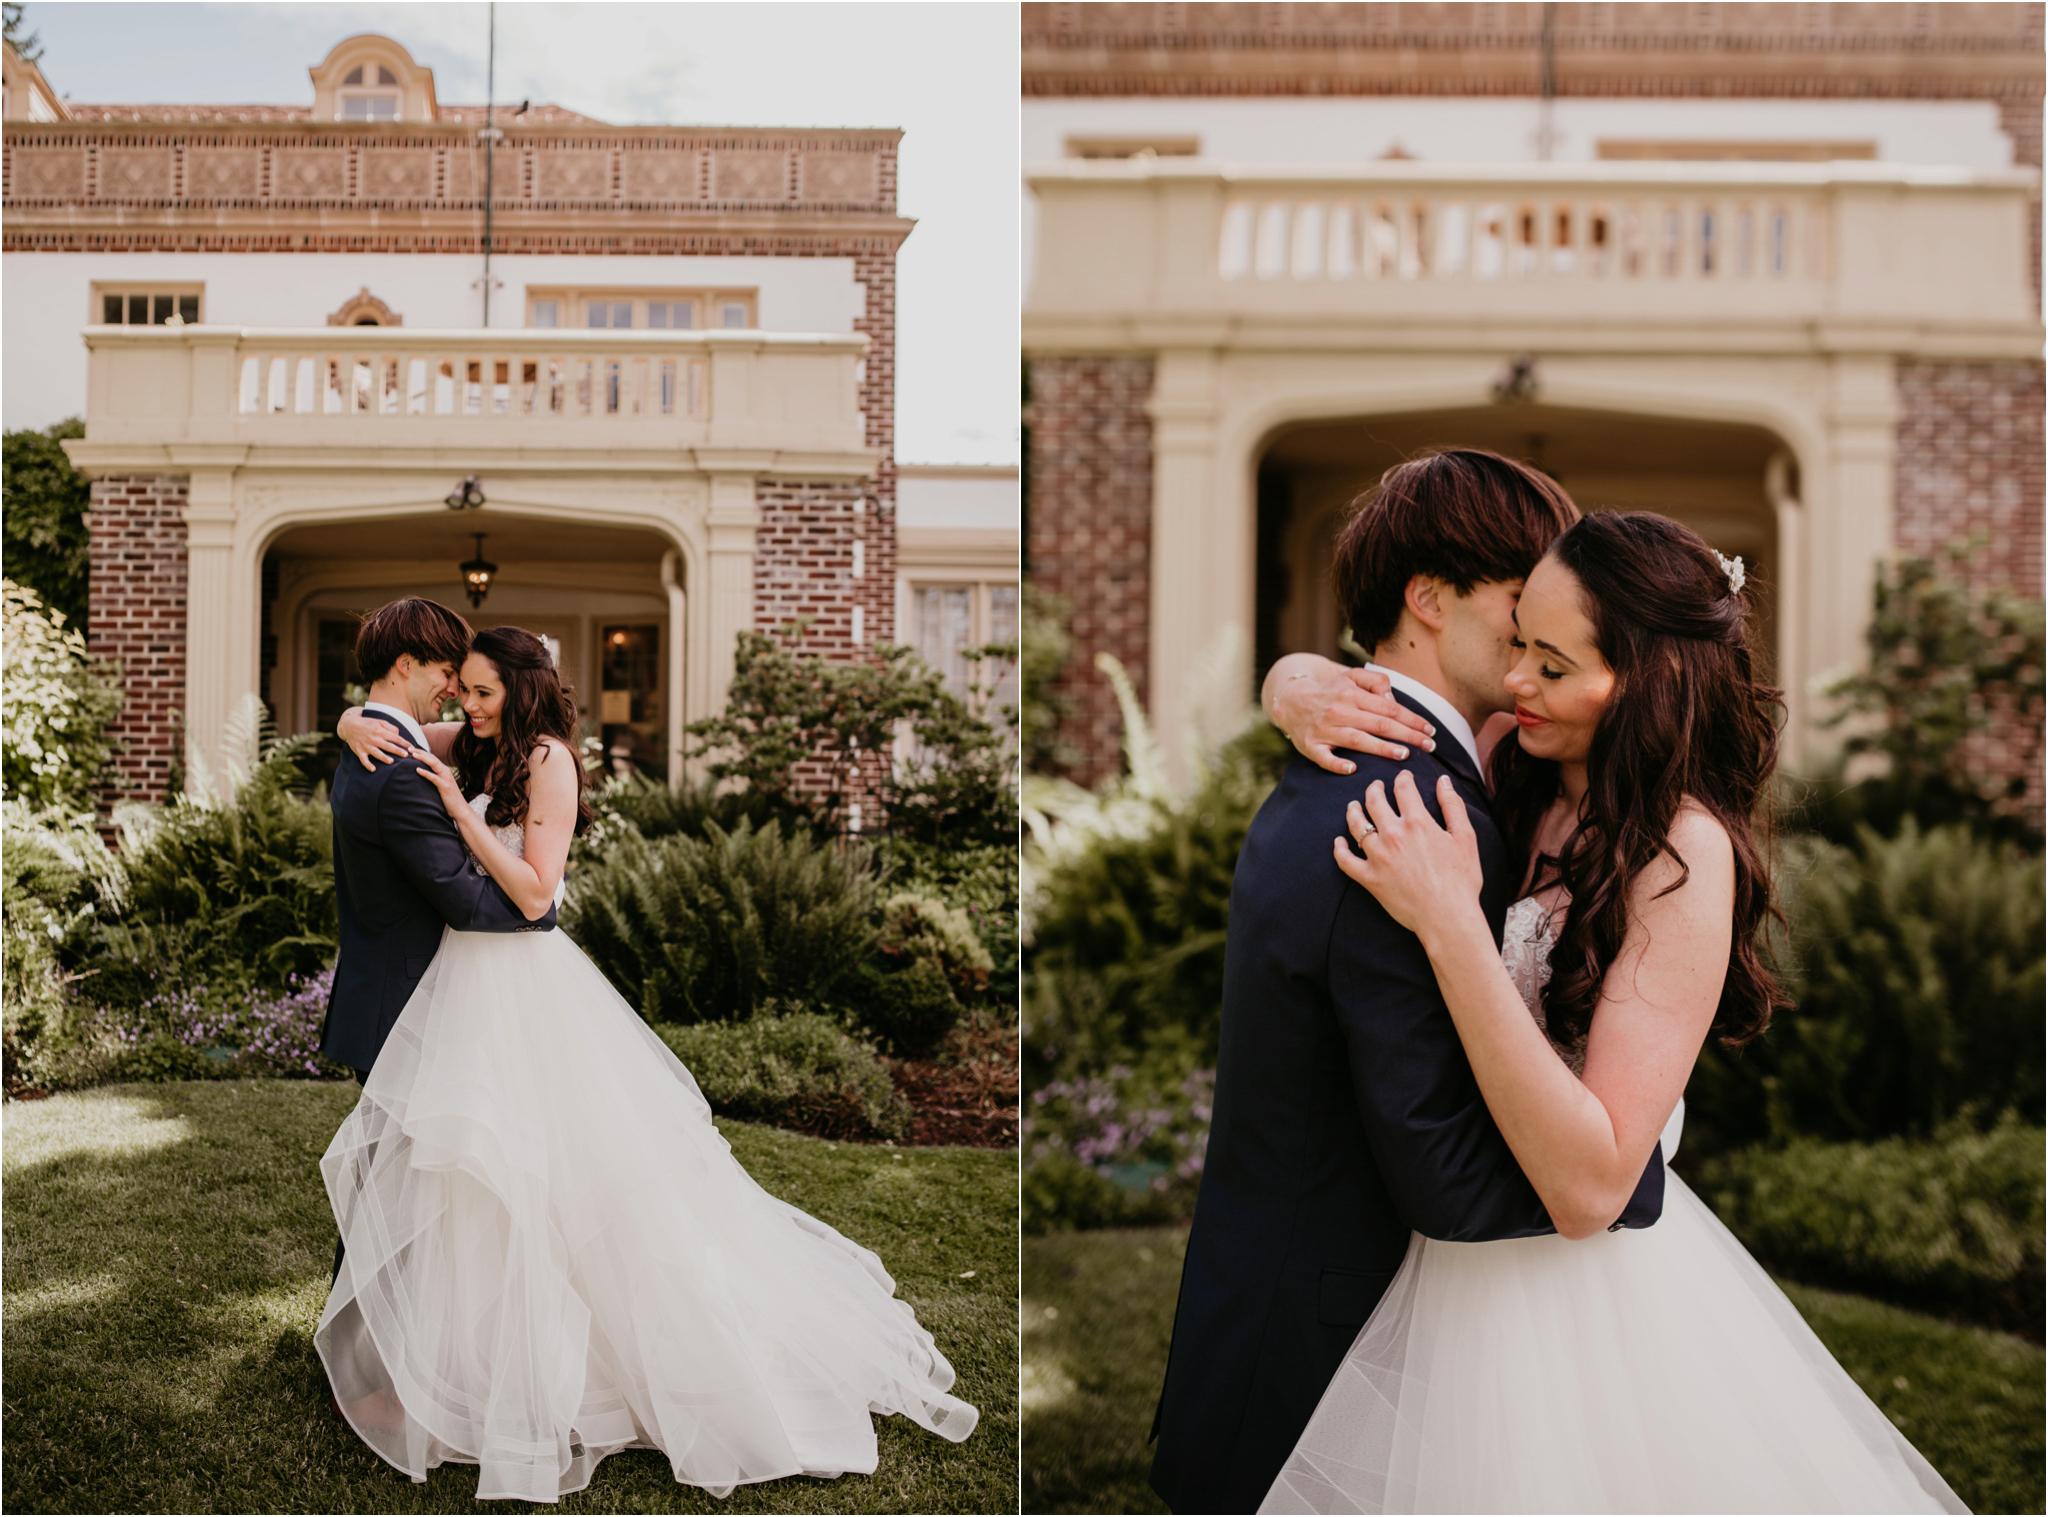 chance-and-ondrea-lairmont-manor-wedding-seattle-photographer-035.jpg